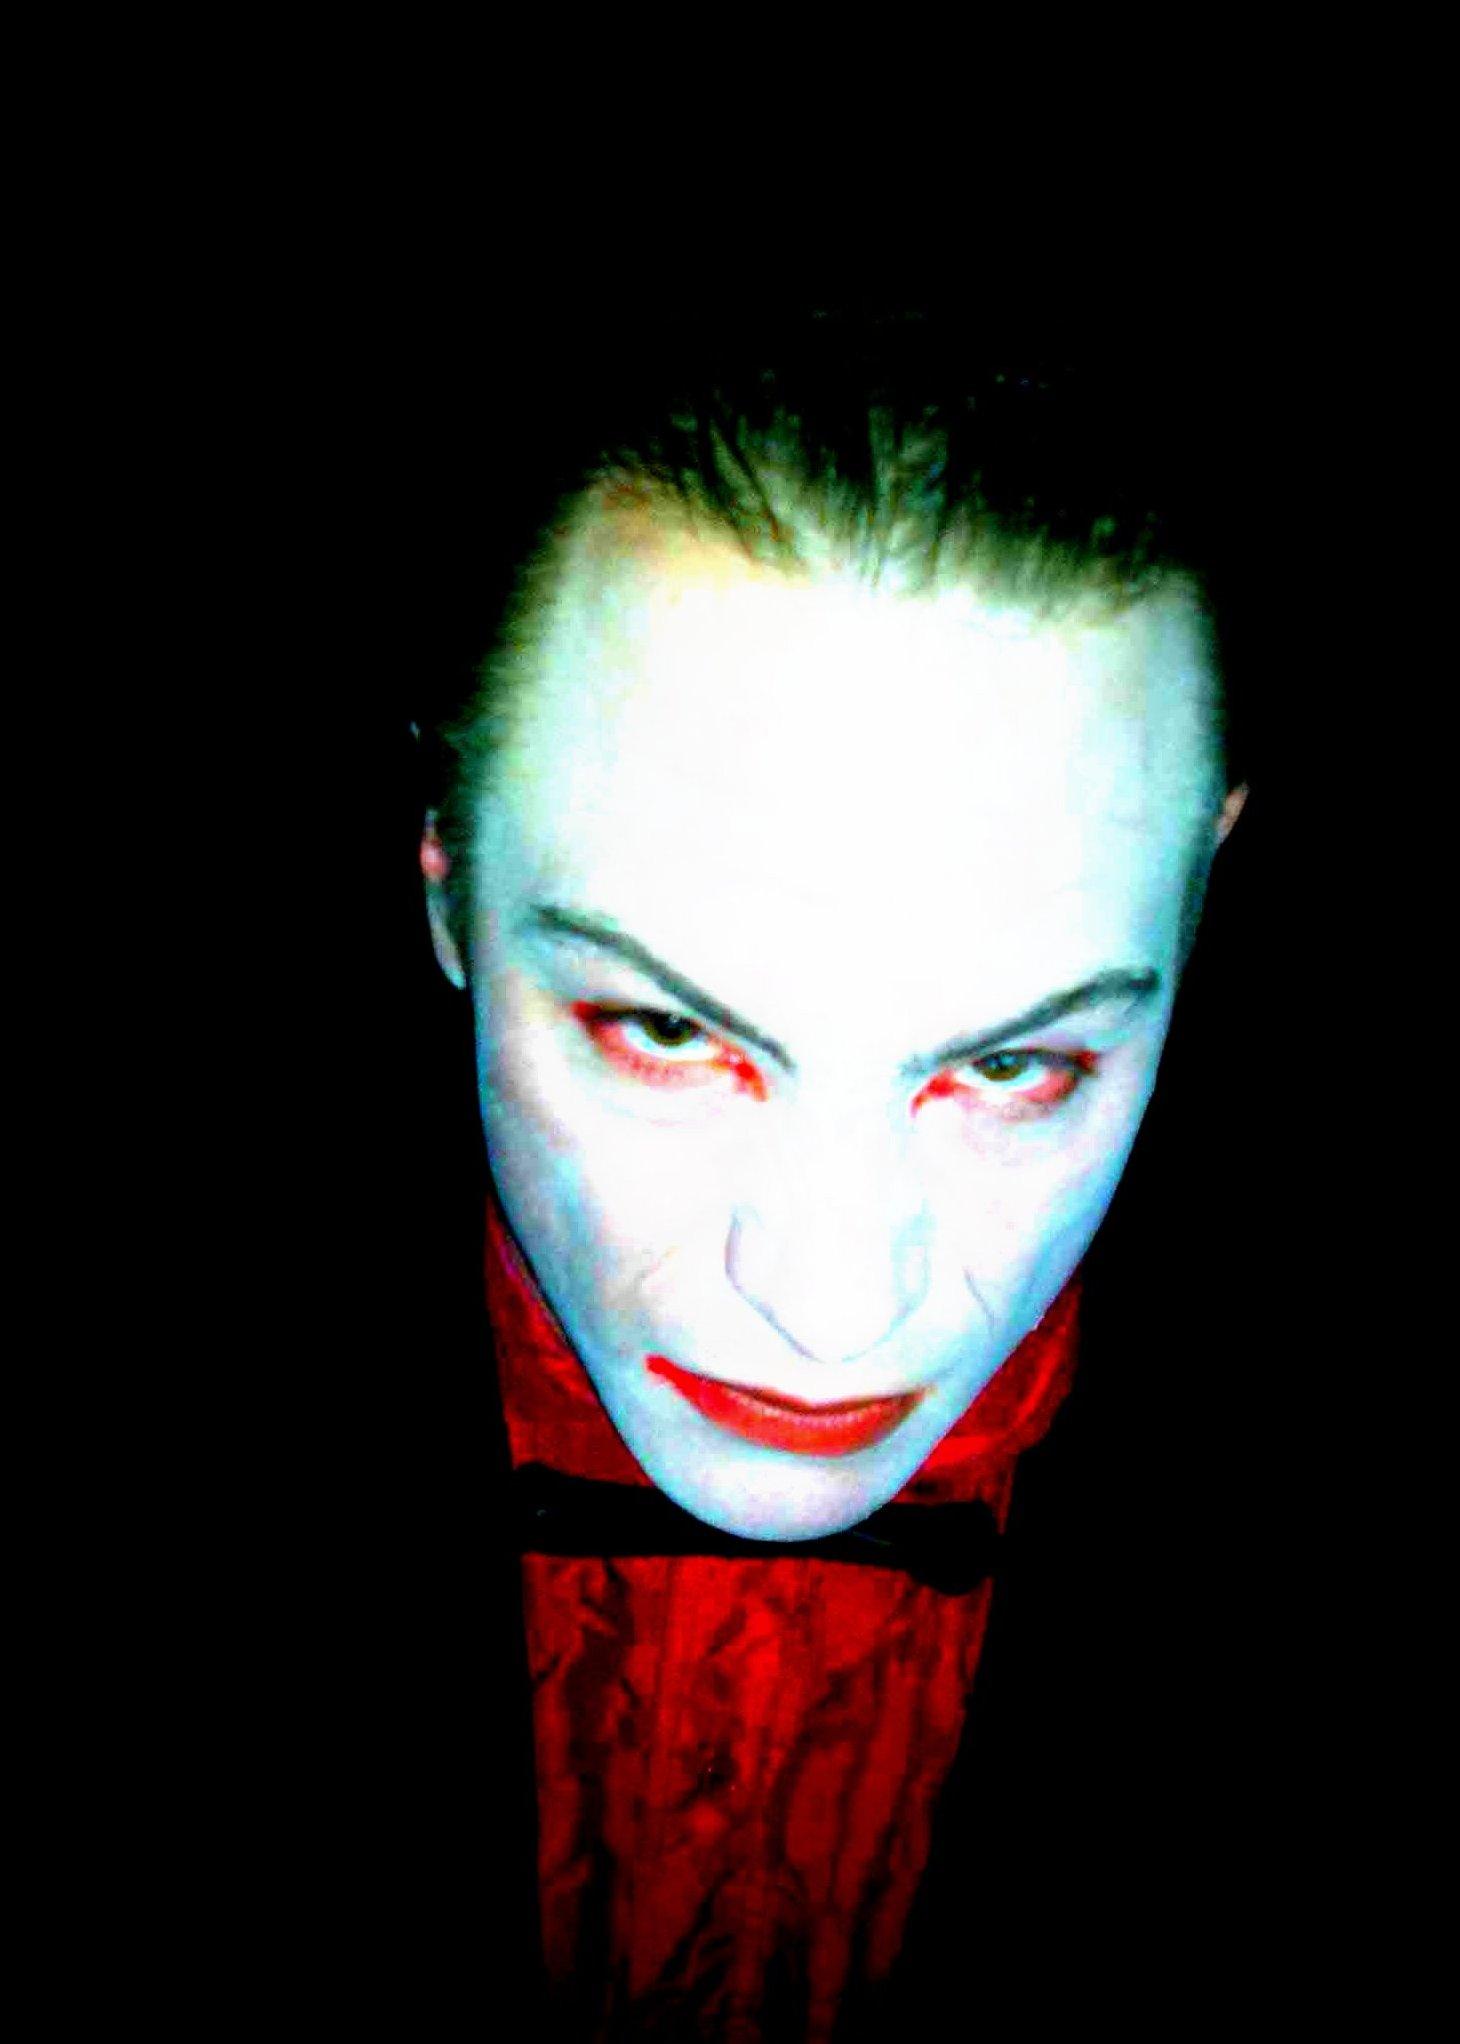 Dracula Vampire by Charlie Burns Tyne & Wear Stilt Walker or Walkabout character Tyne & Wear